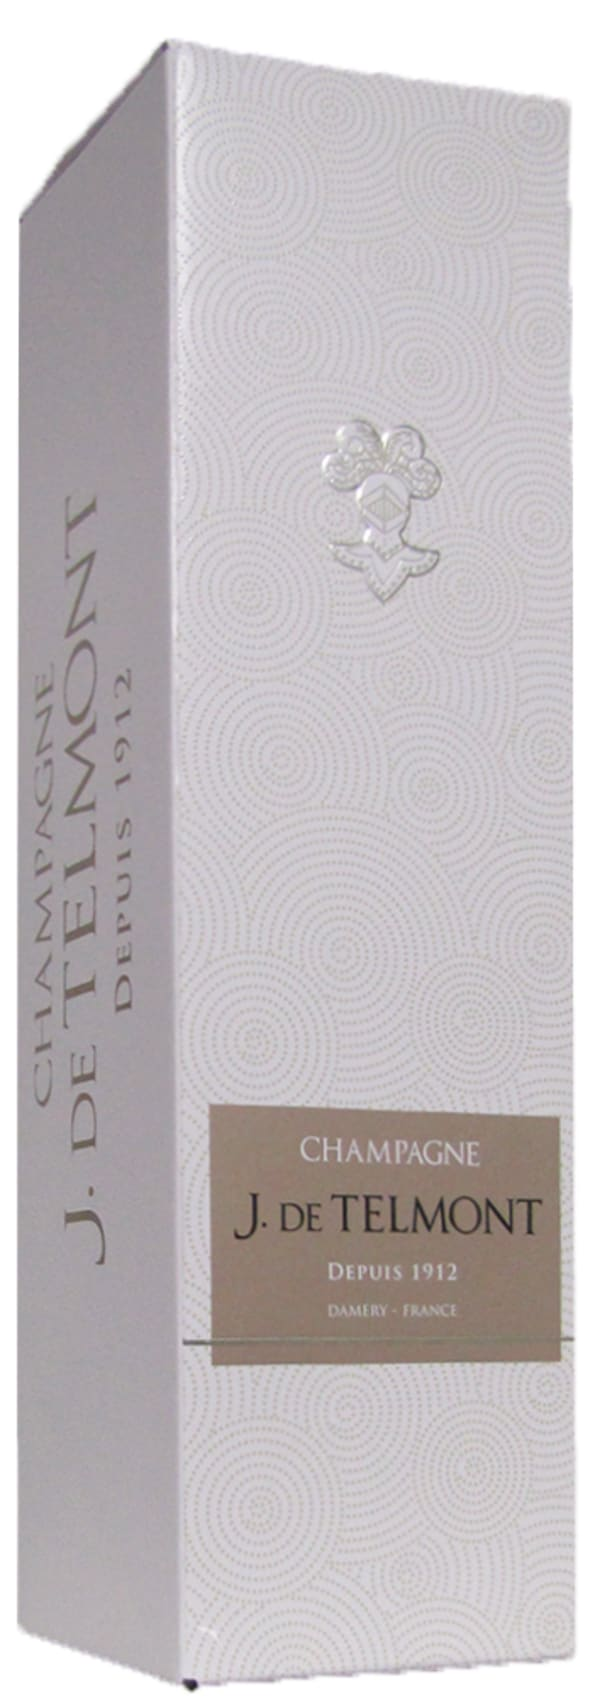 J. de Telmont Heritage Champagne Brut 1969